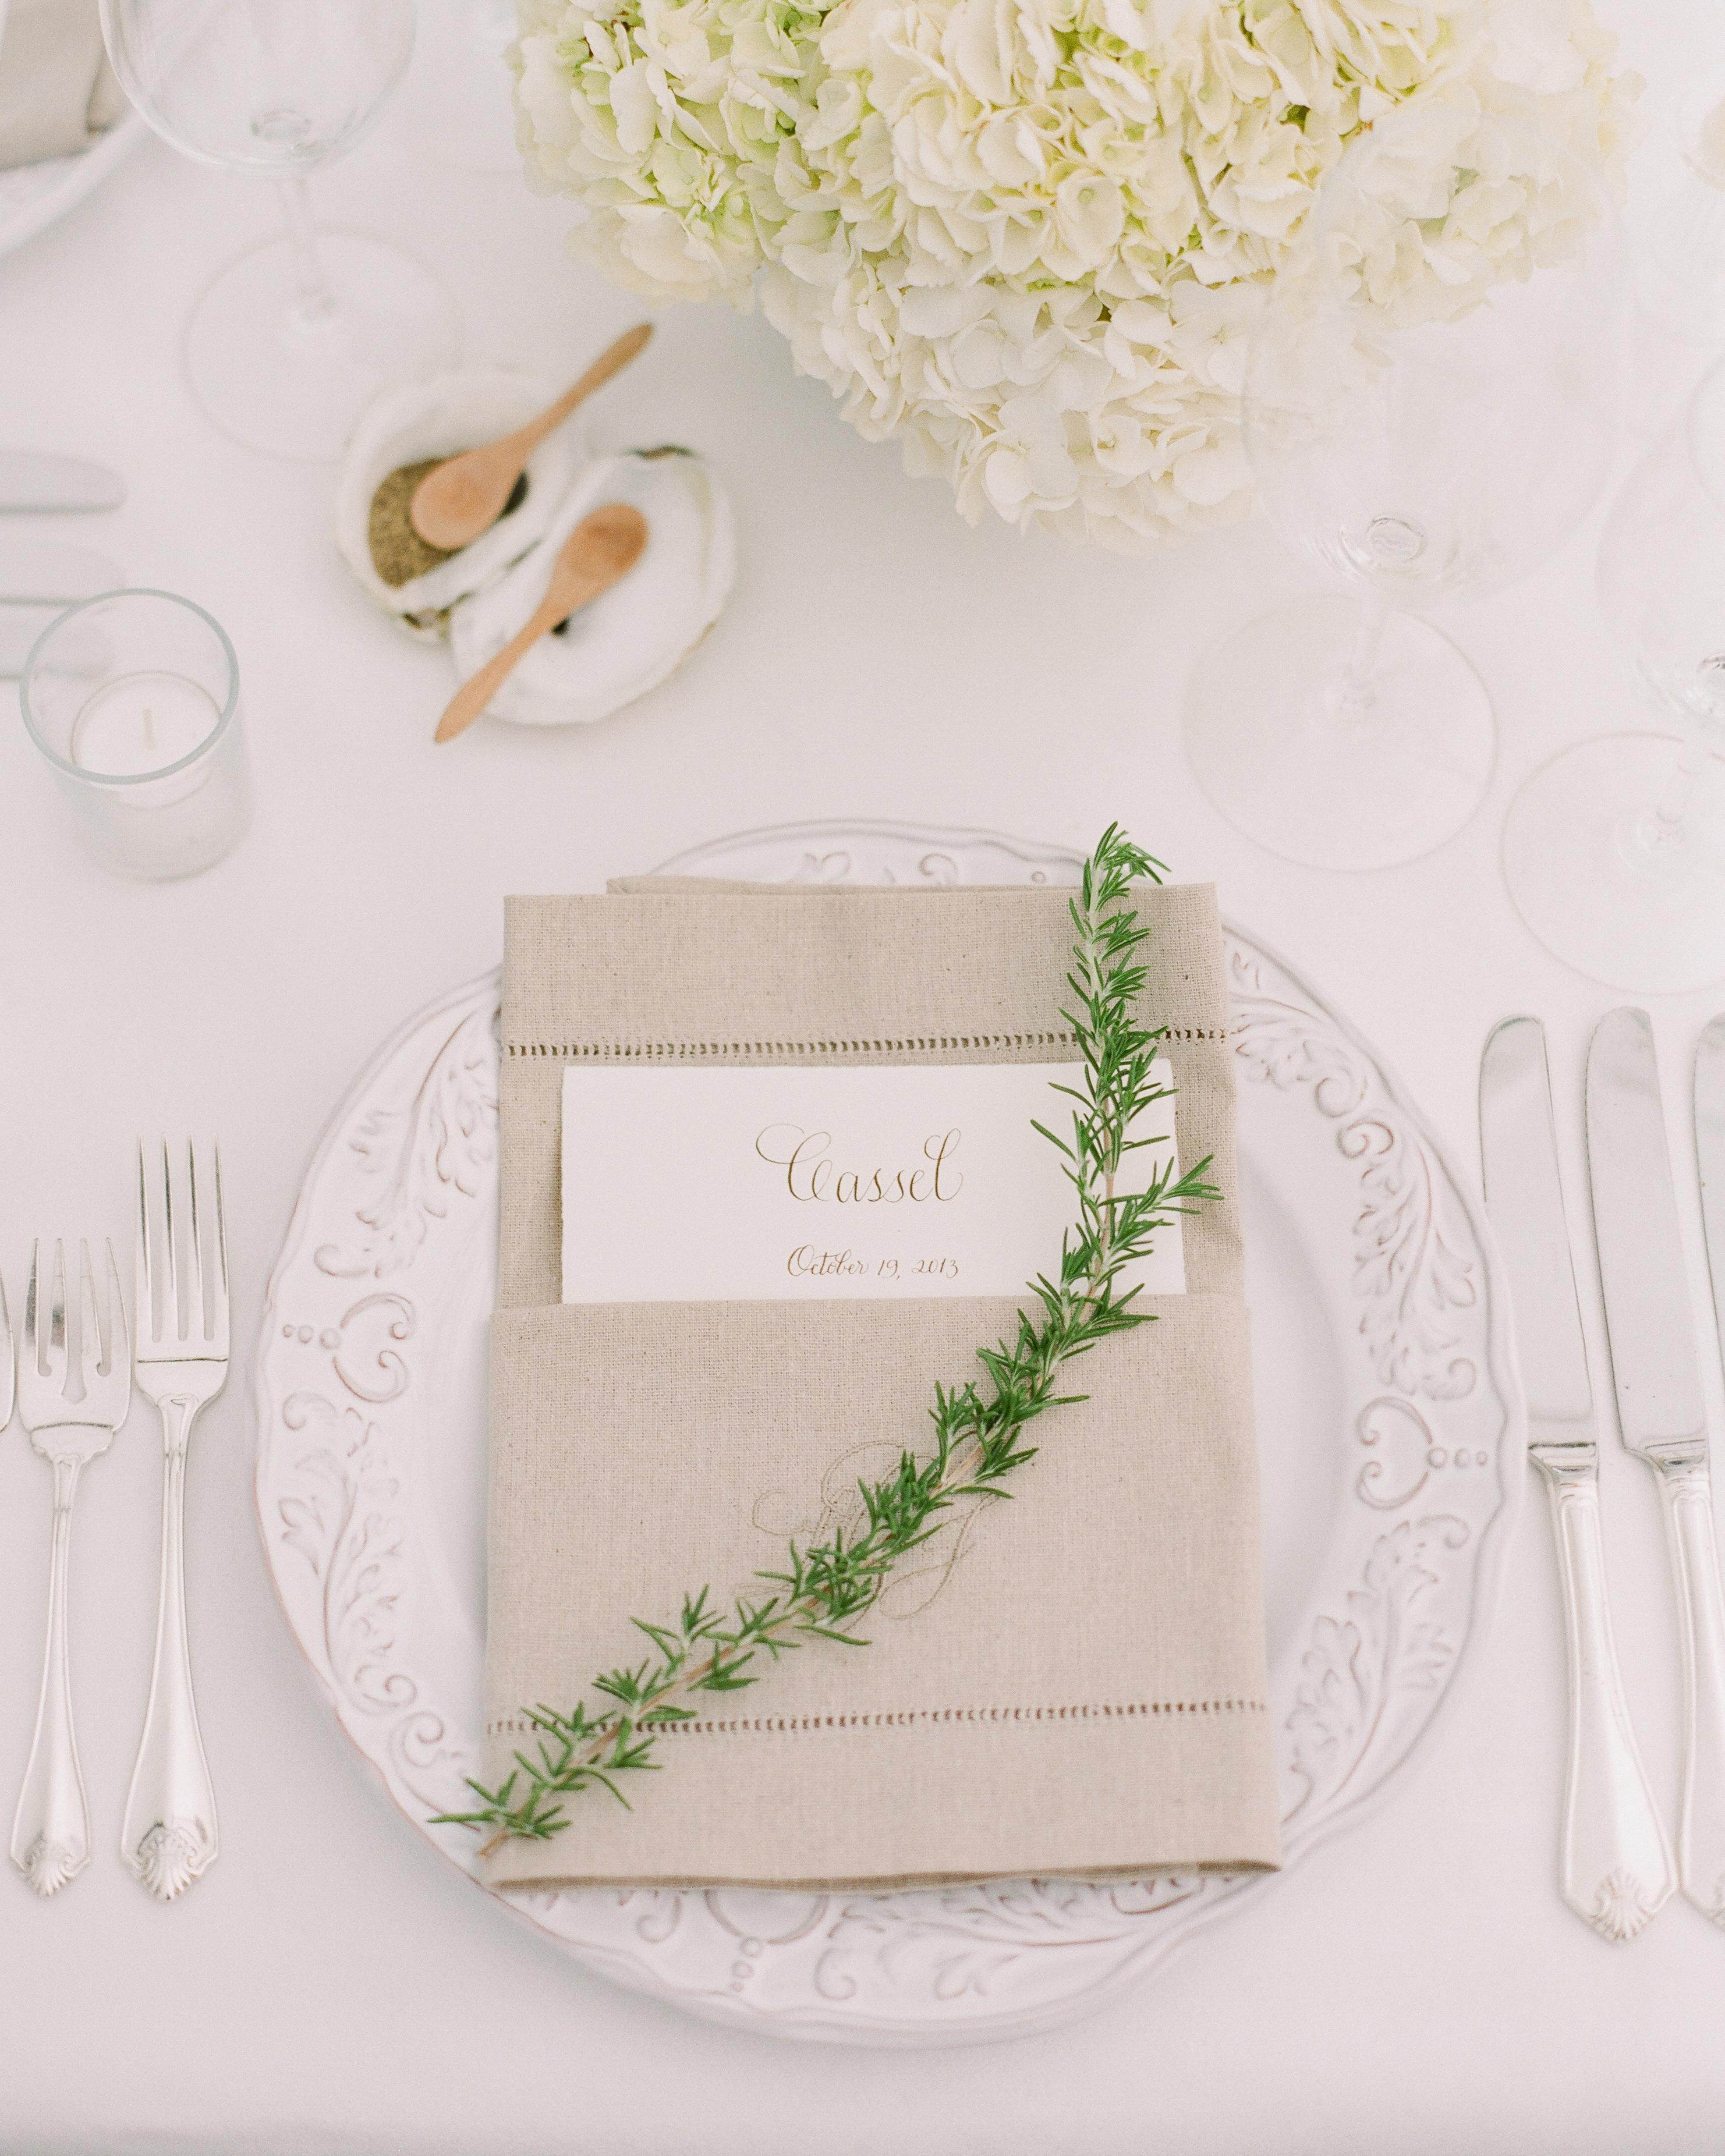 lindsey-josh-wedding-menu-card-0414.jpg